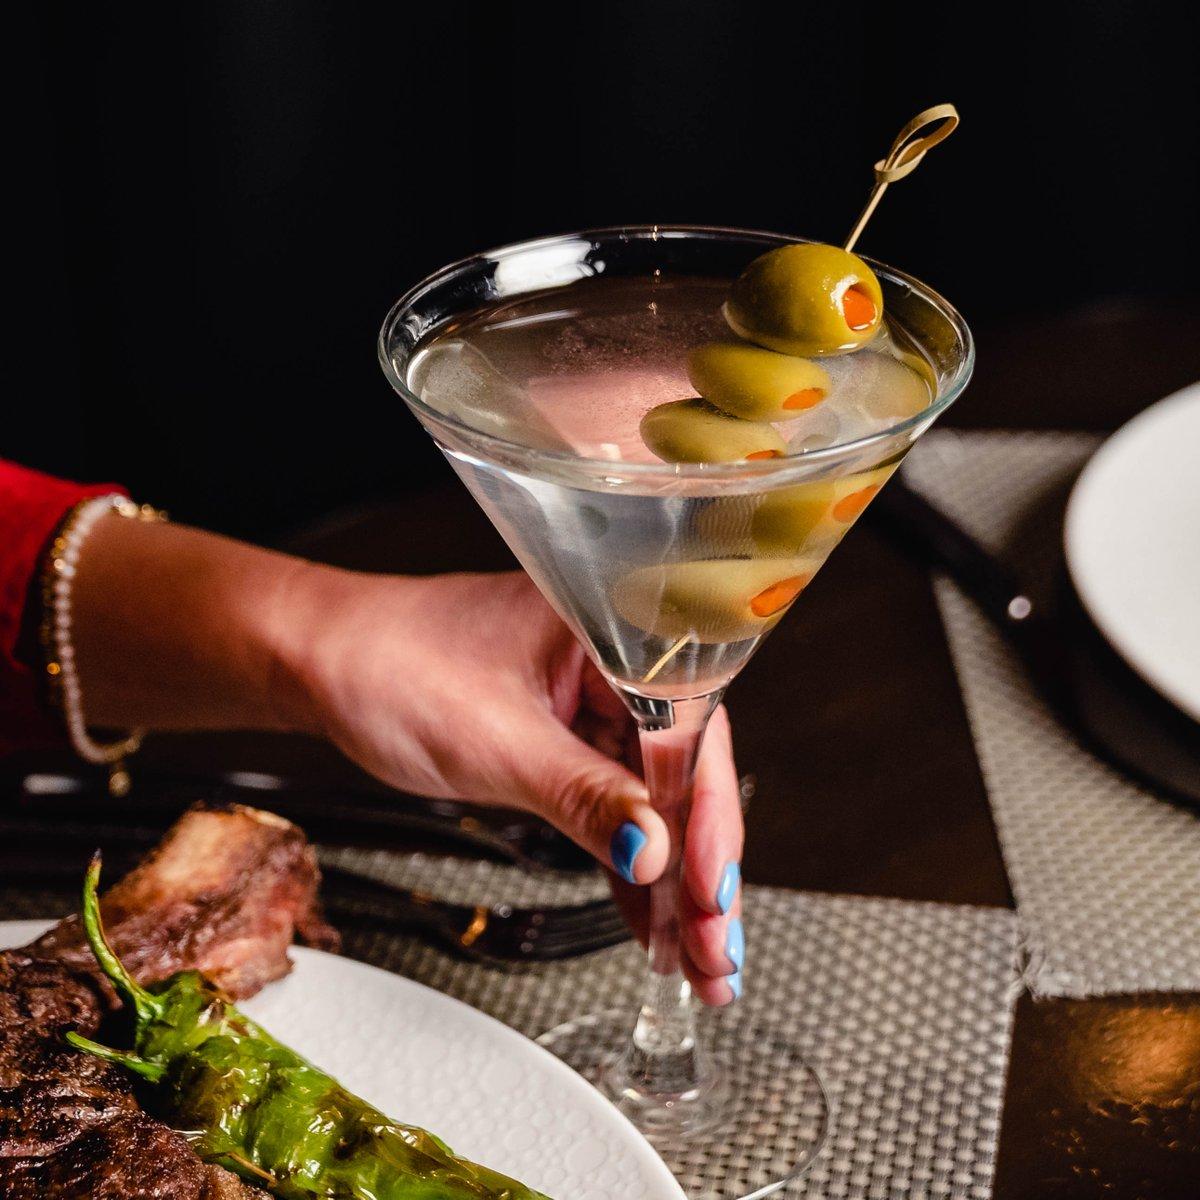 Tender Steakhouse, F&B, Food, Luxor, LUX, Happy Hour,